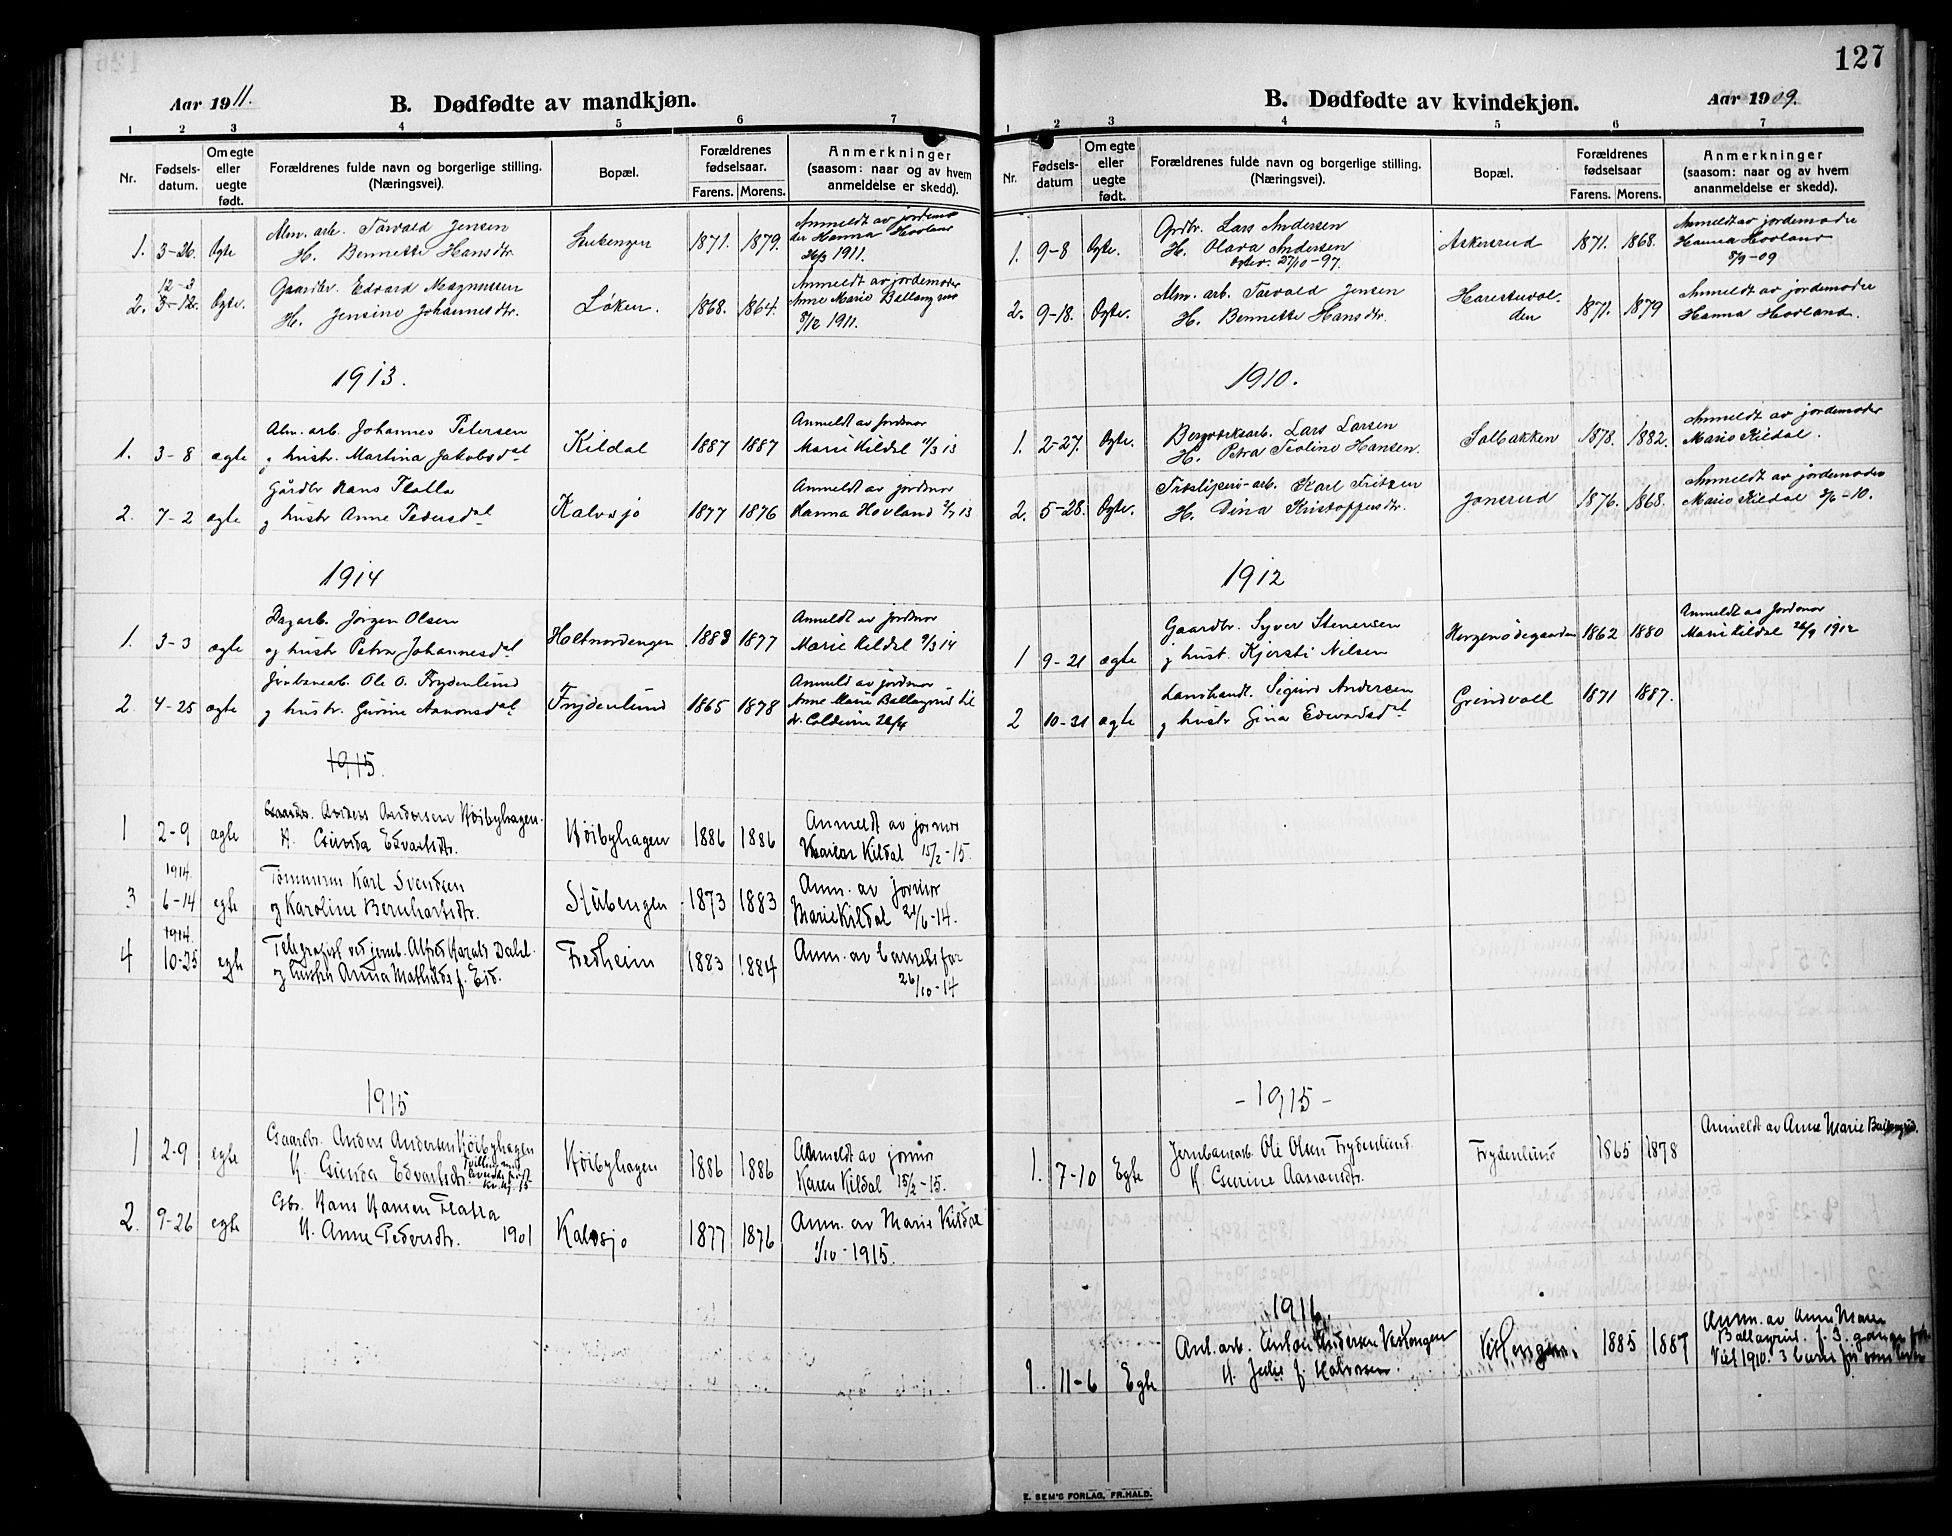 SAH, Lunner prestekontor, H/Ha/Hab/L0001: Klokkerbok nr. 1, 1909-1922, s. 127